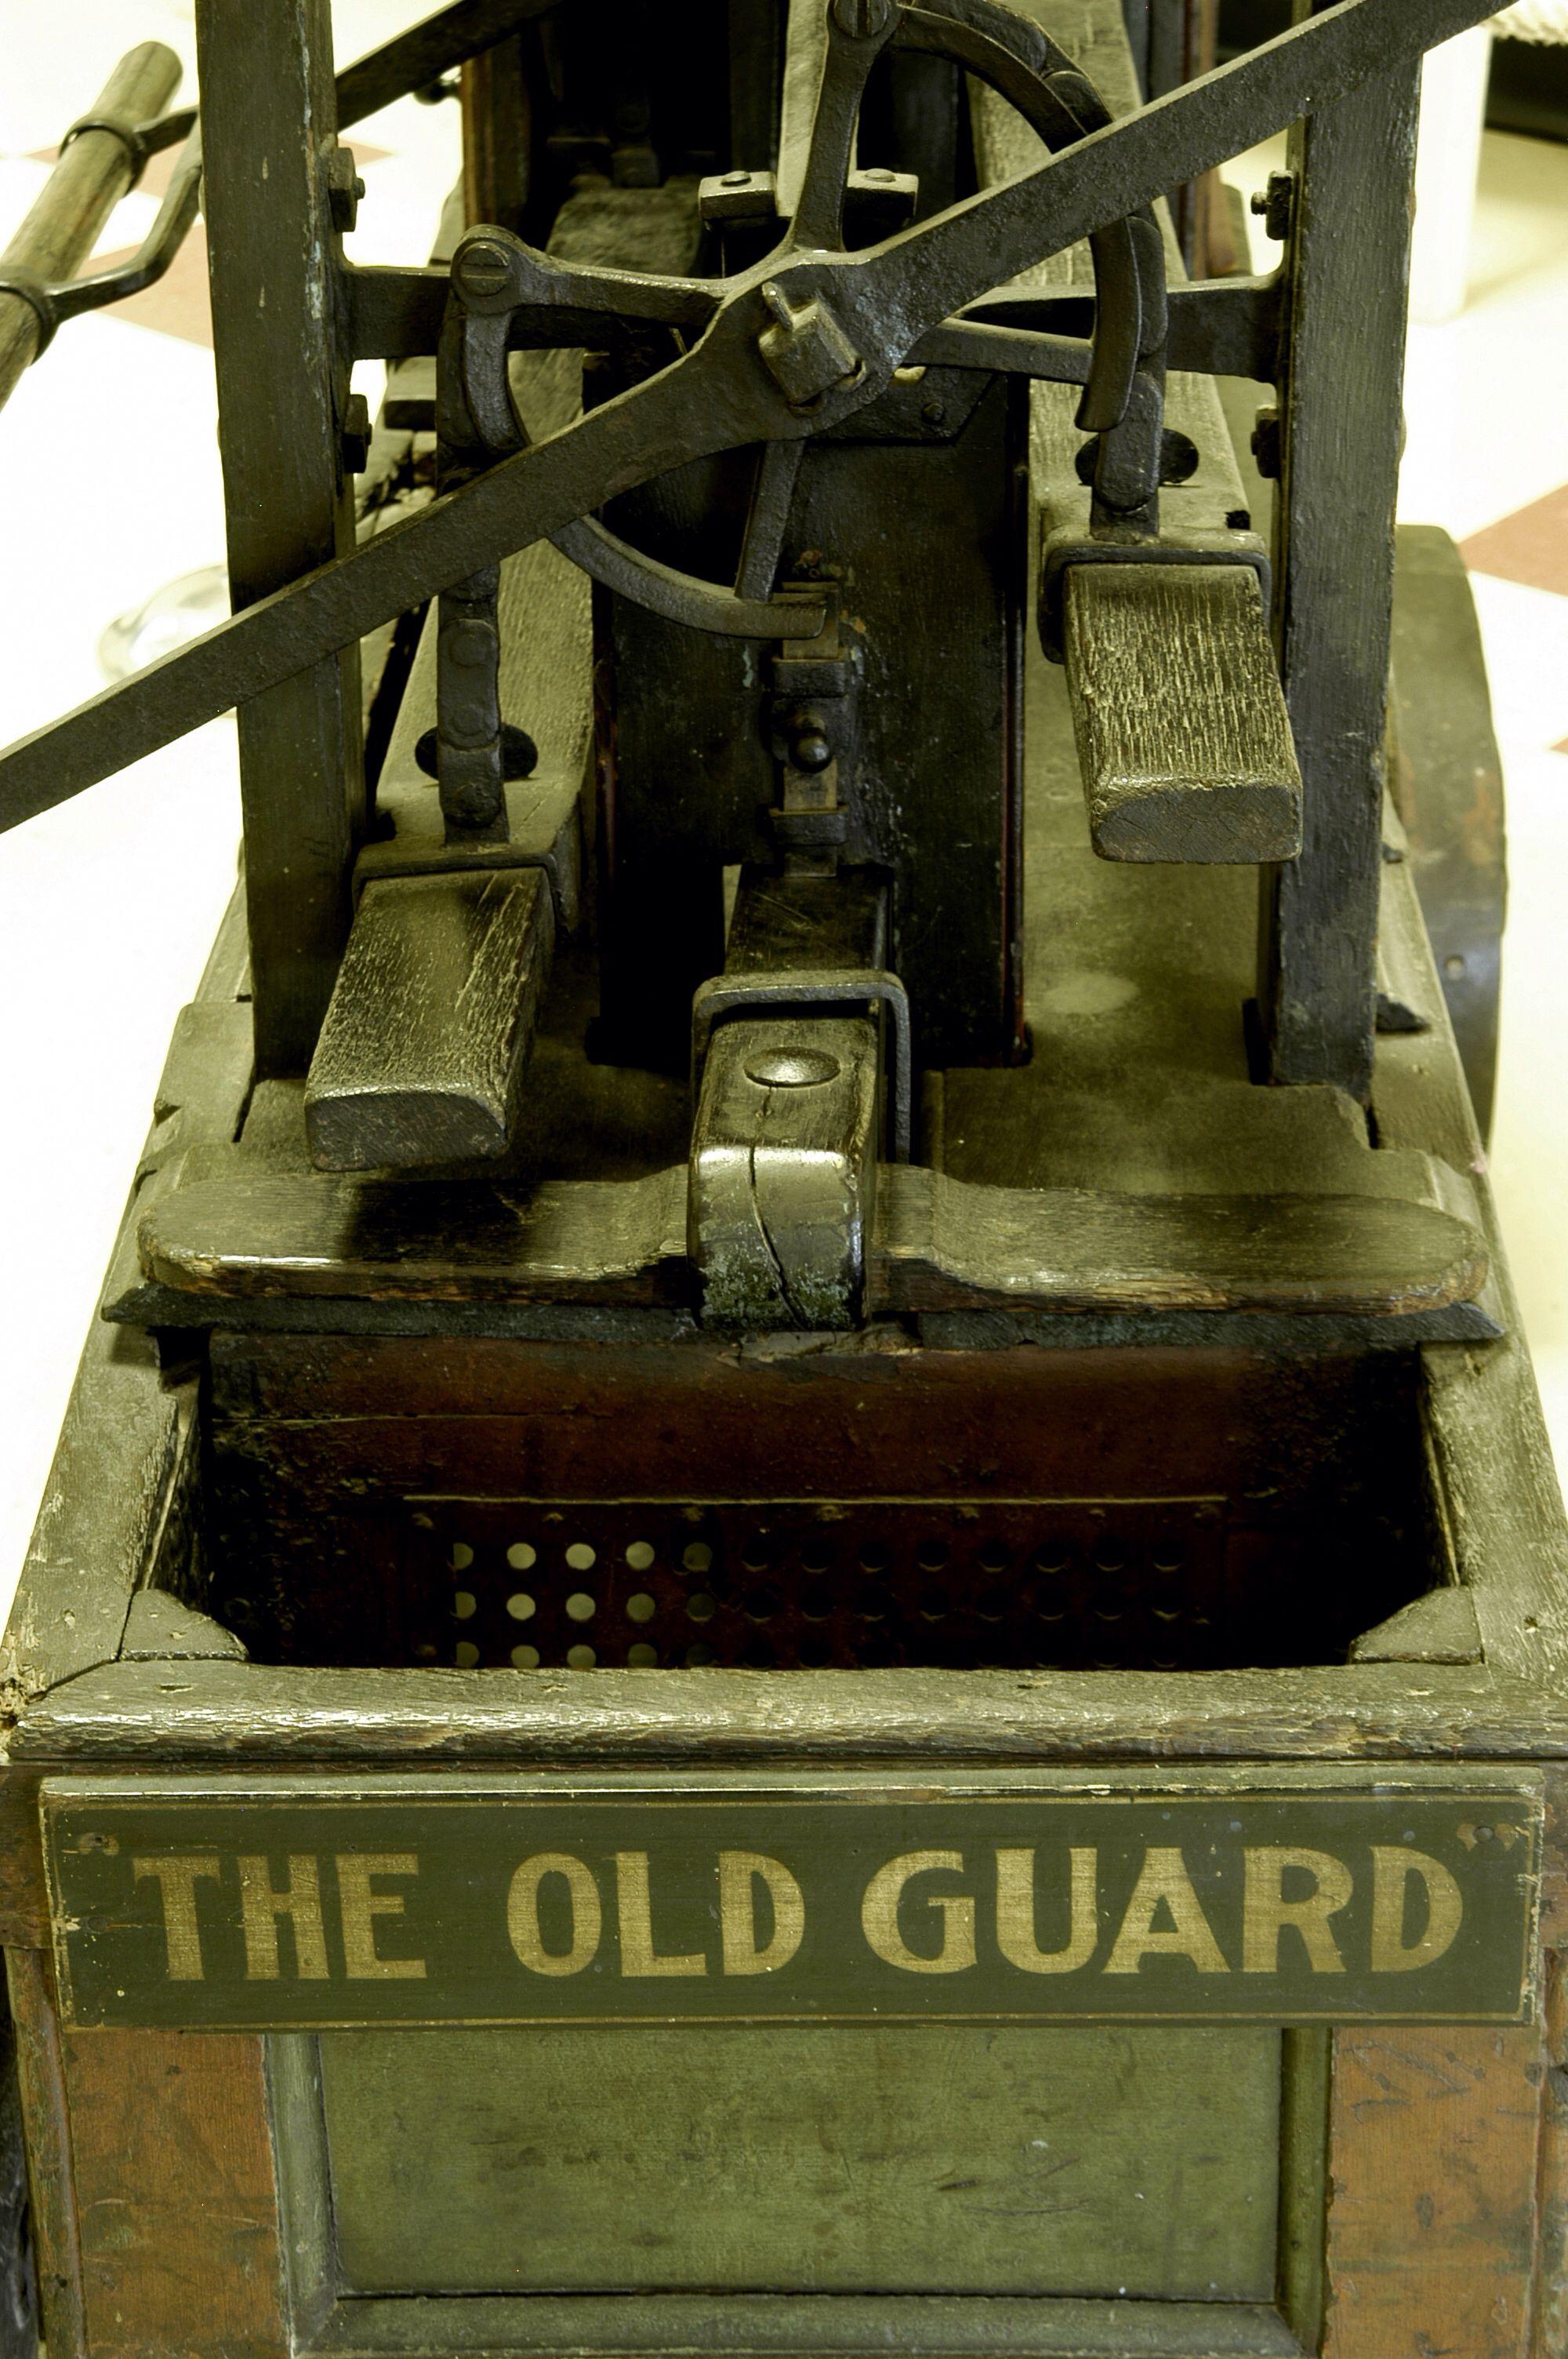 Built in England, this Richard Newsham pumper is the